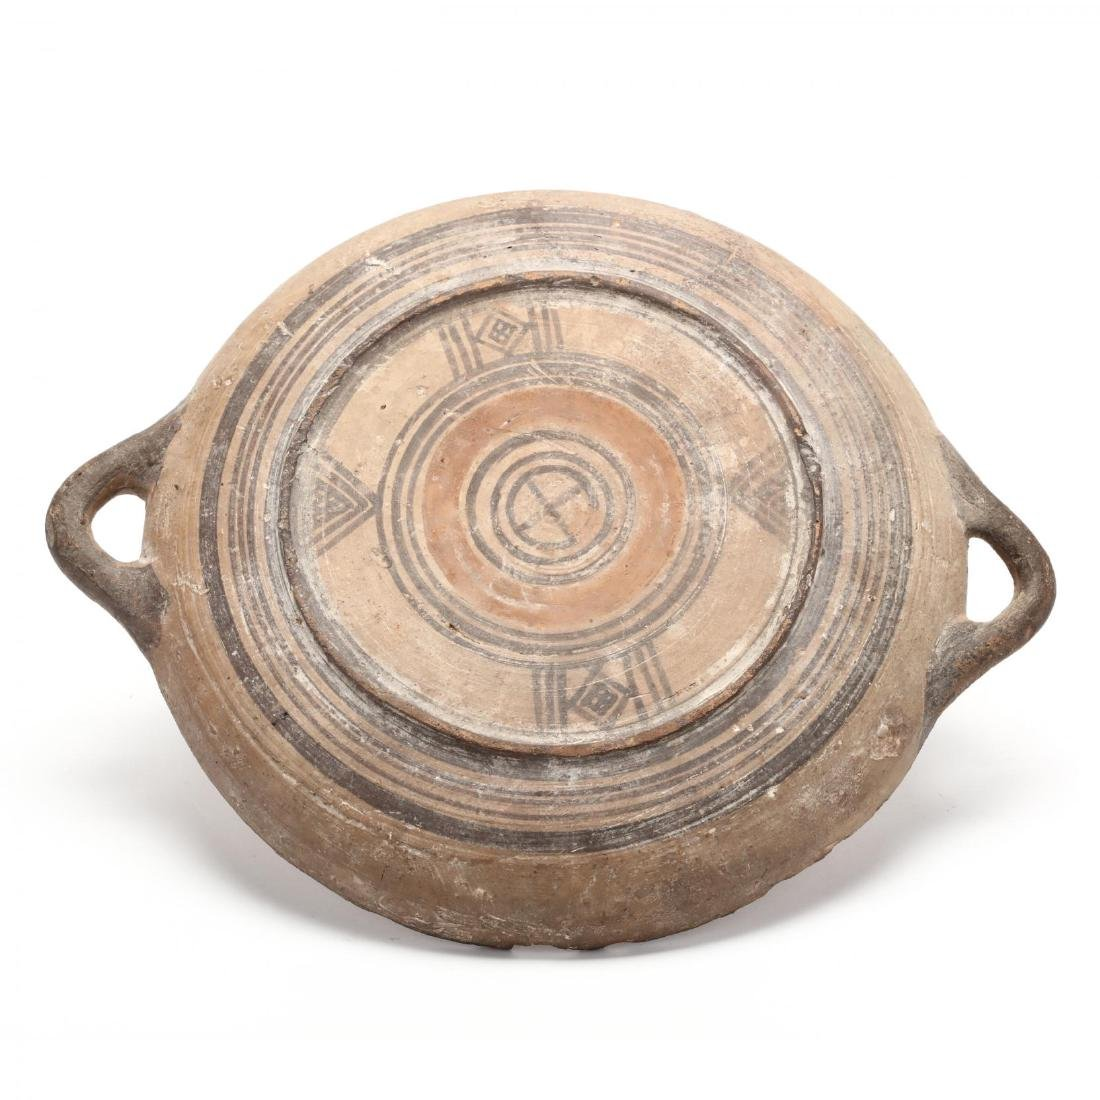 Cypro-Geometric Bichrome Ware Dish - 4